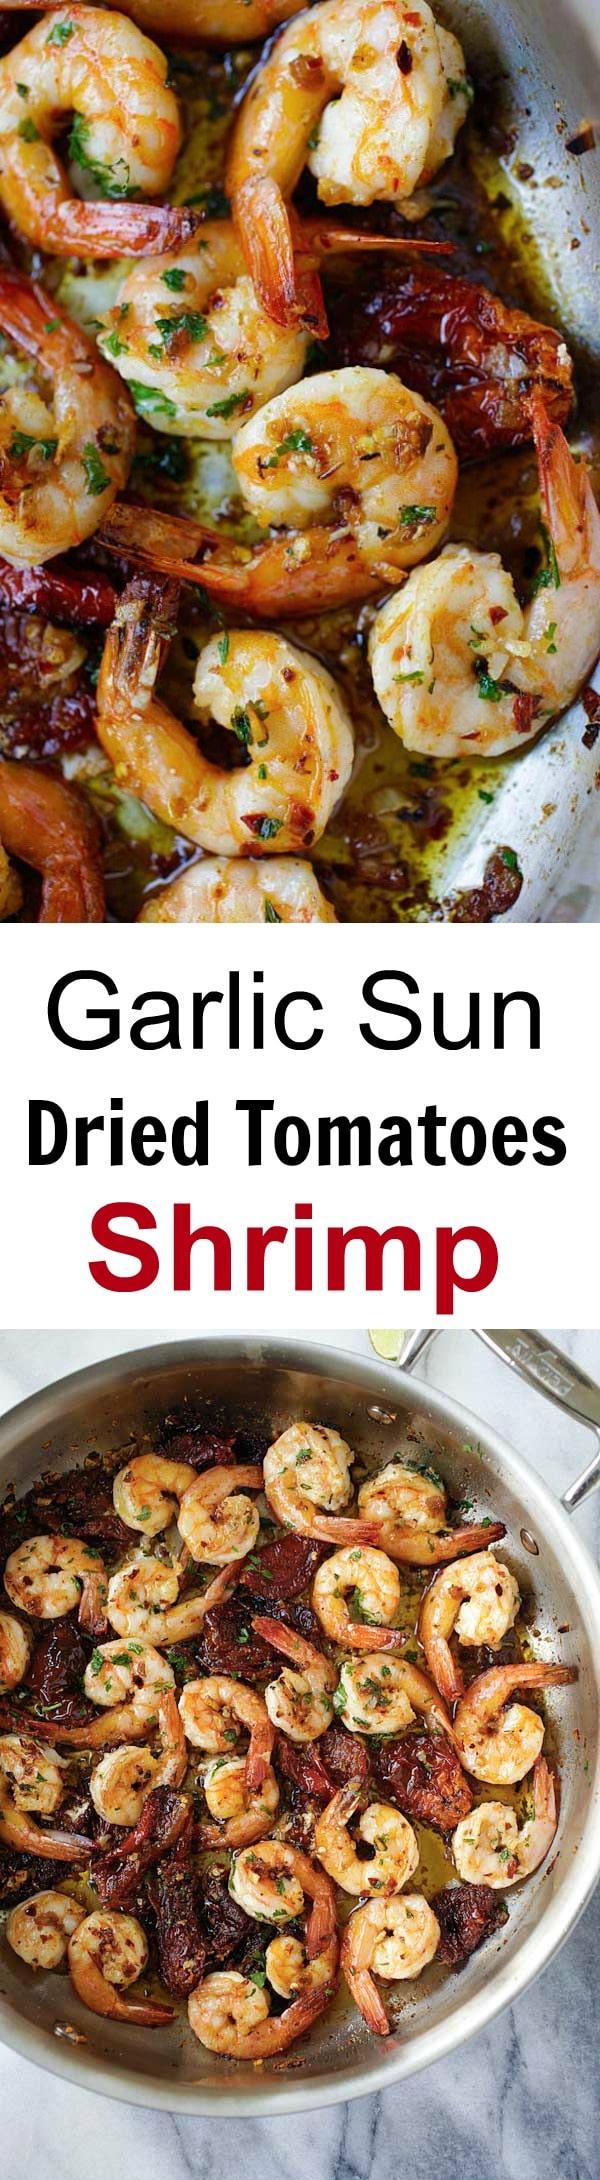 Garlic Sun-Dried Tomatoes Roasted Shrimp - Best garlic roasted shrimp recipe ever! Learn how to make this Spanish/Mediterranean dish | rasamalaysia.com